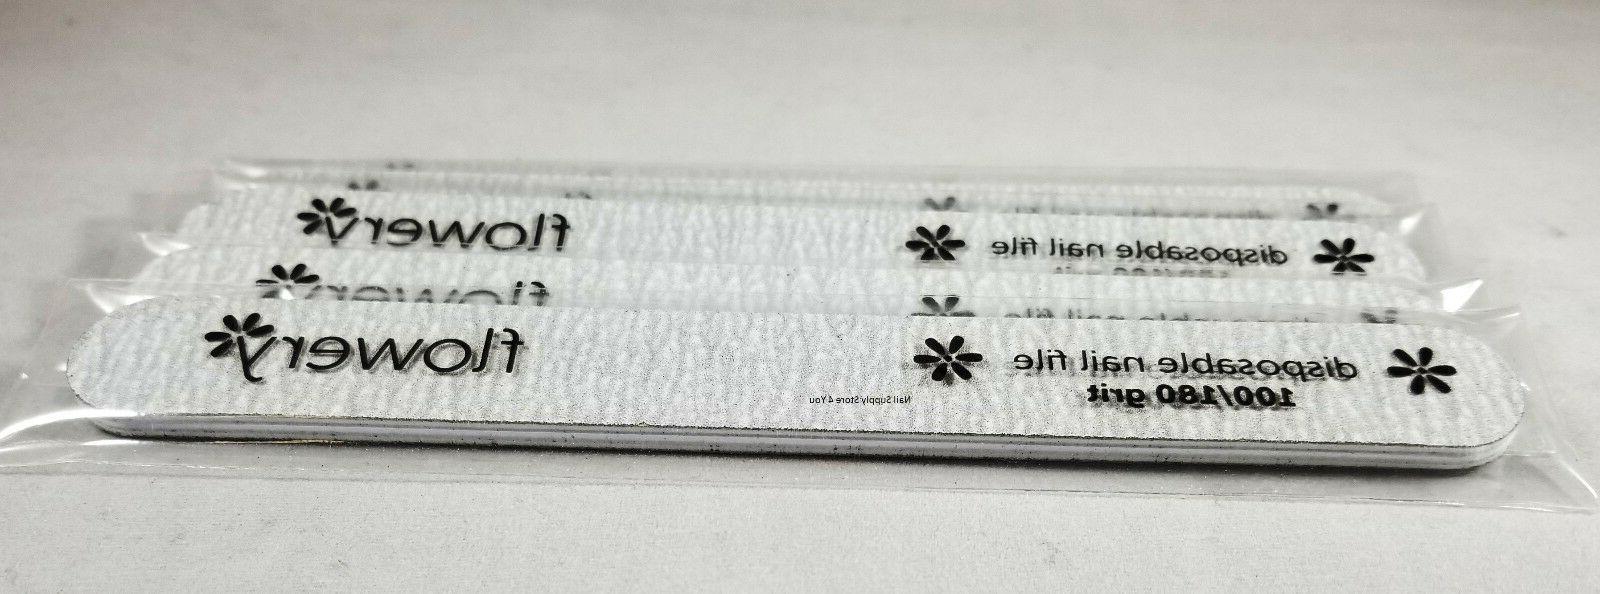 silver streak cushion core file 100 180